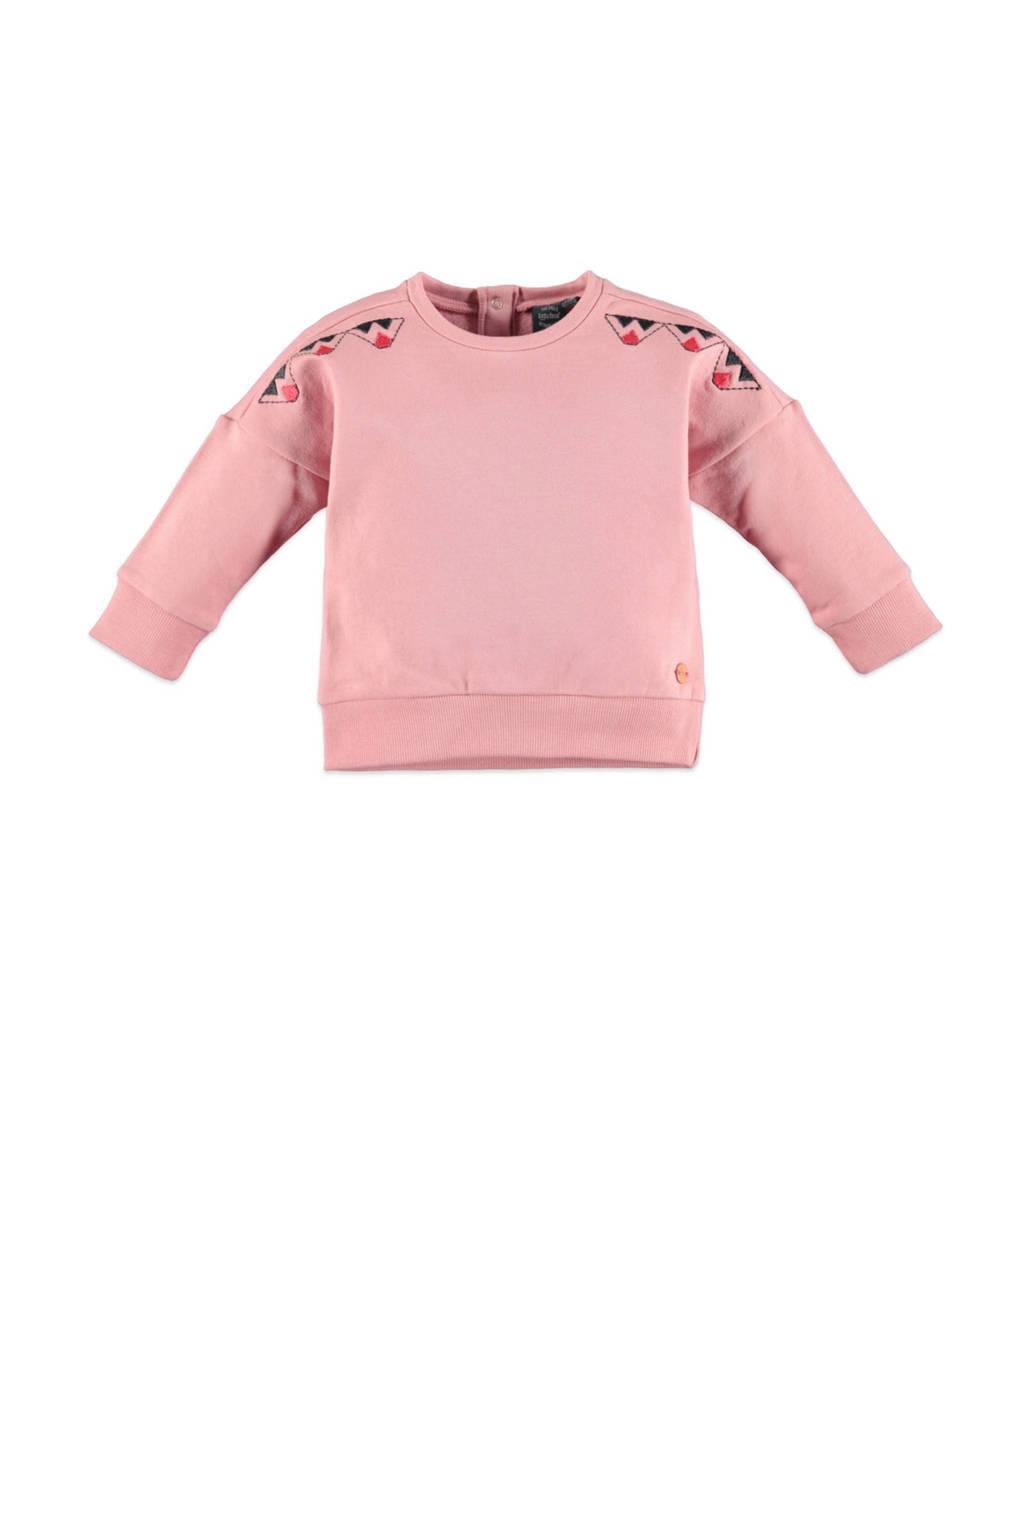 Babyface longsleeve met printopdruk roze, Roze